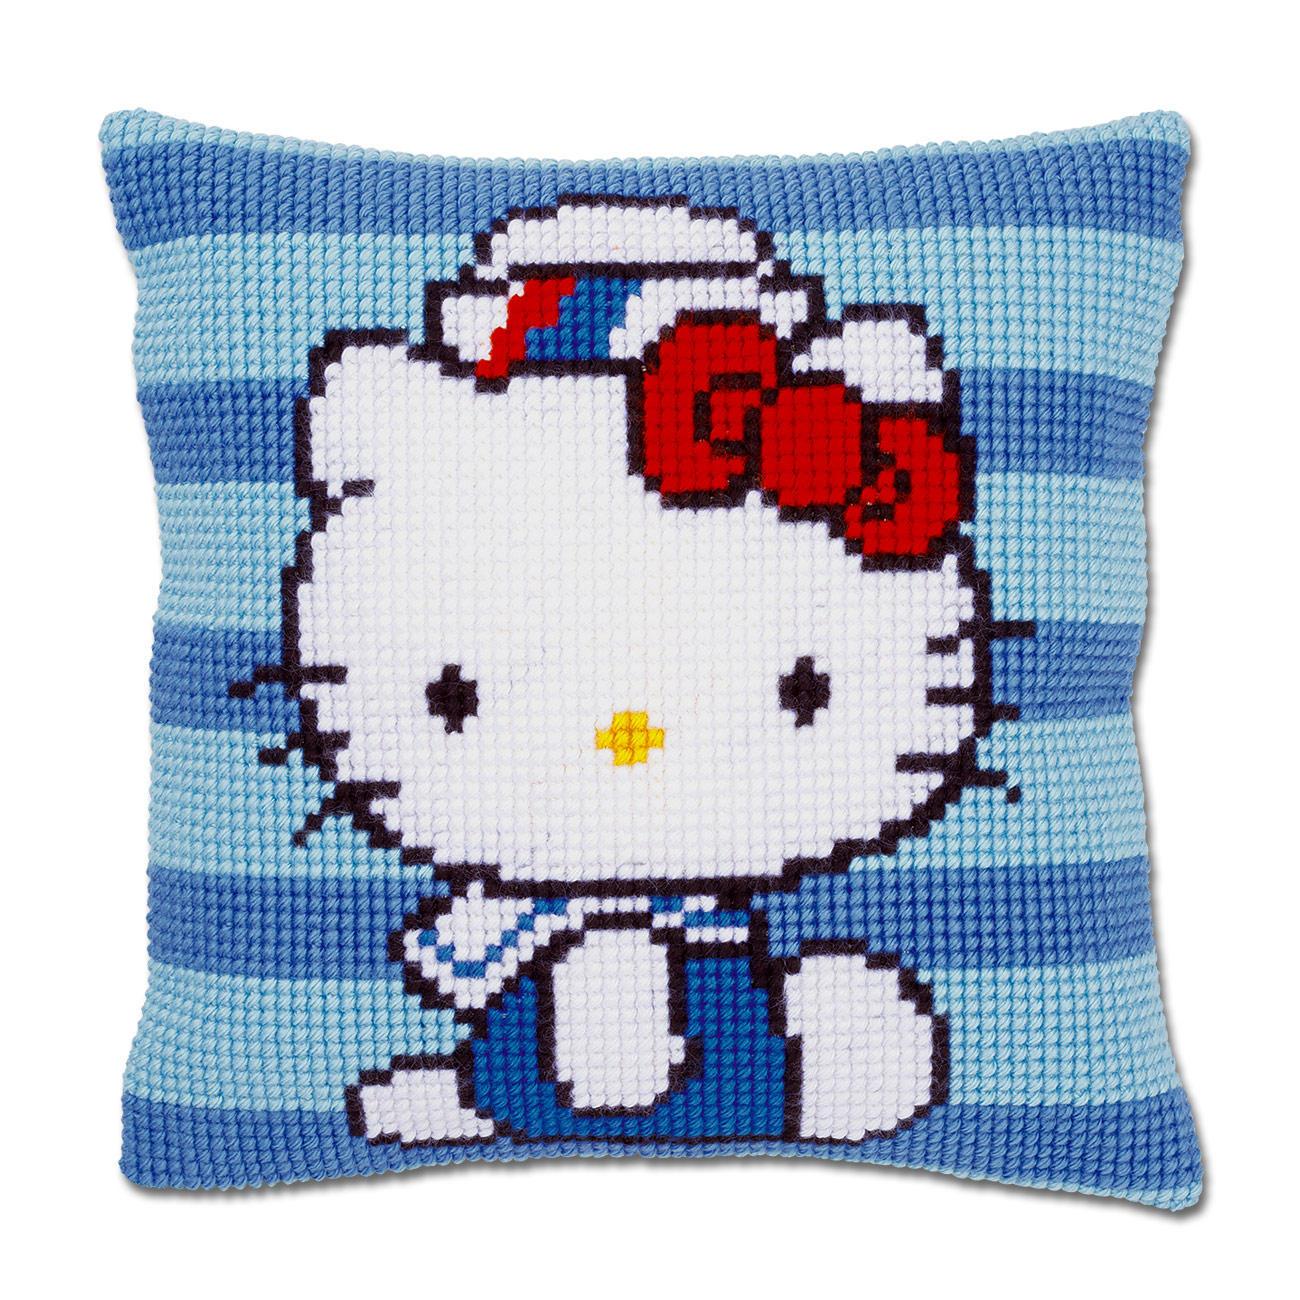 stickkissen hello kitty matrose. Black Bedroom Furniture Sets. Home Design Ideas